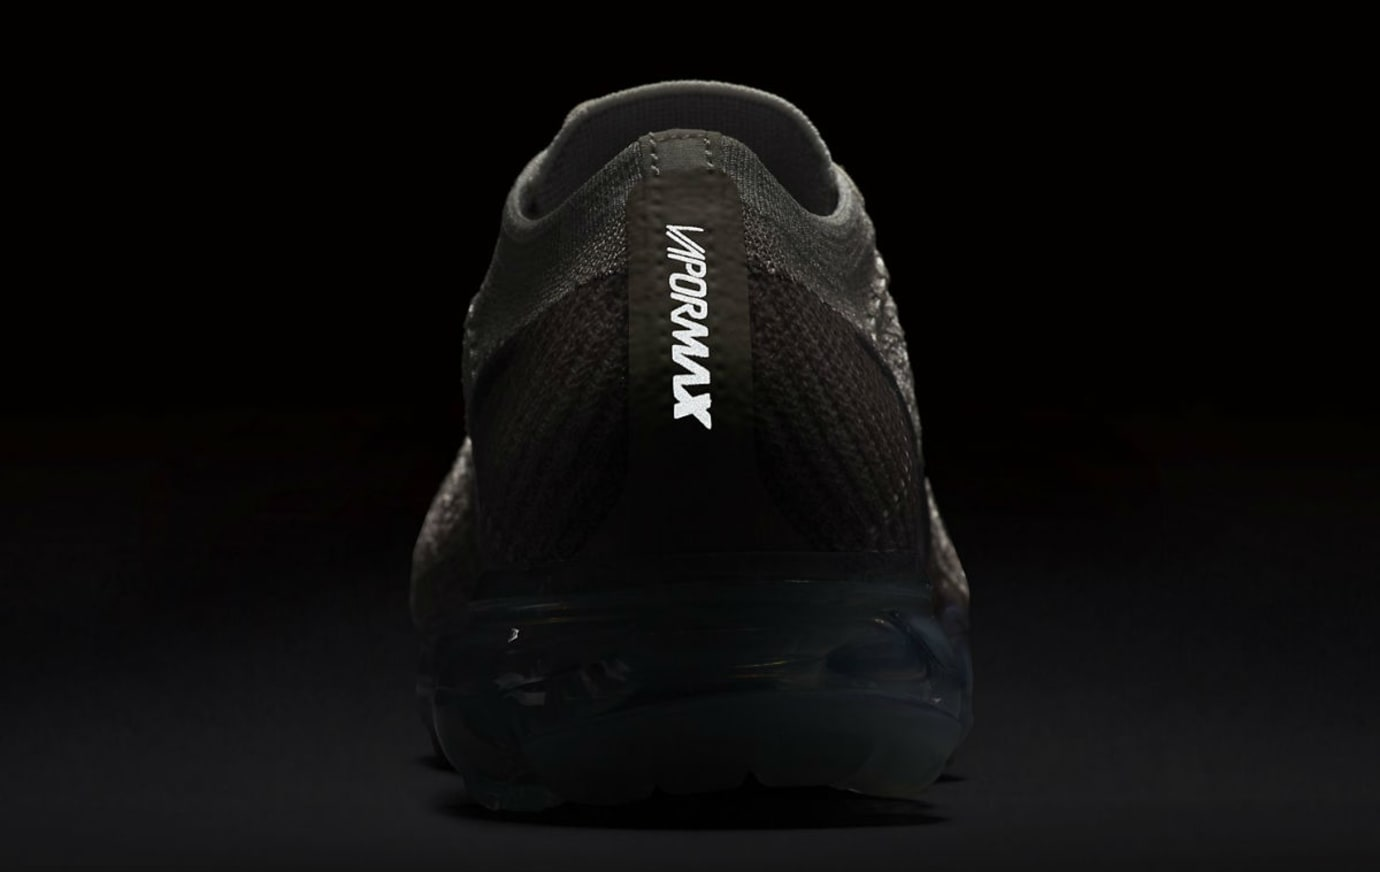 Nike Air VaporMax String Chrome Release Date 3M 849557-202